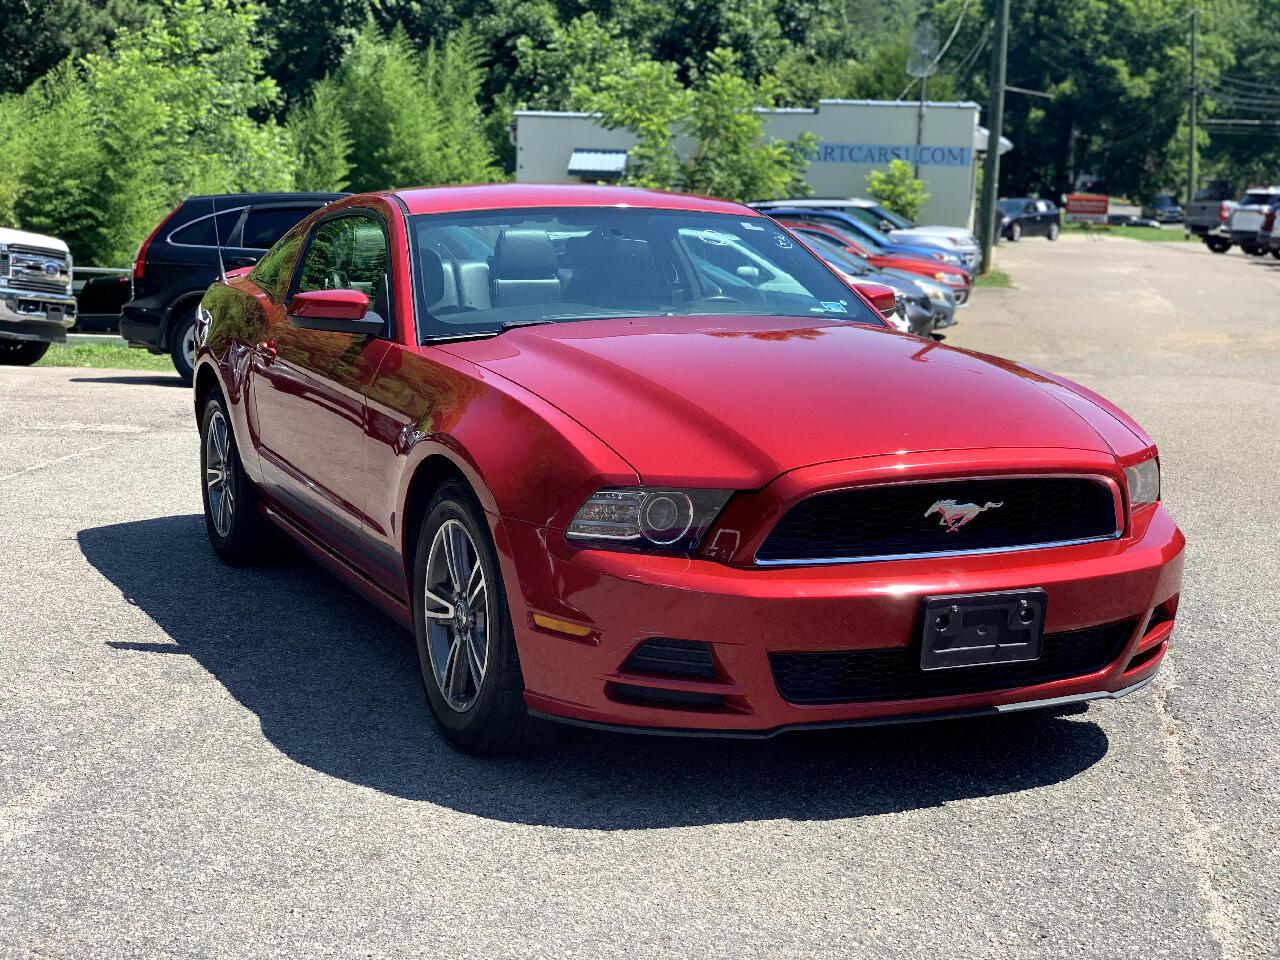 Ford Mustang 2dr Cpe V6 Premium 2013